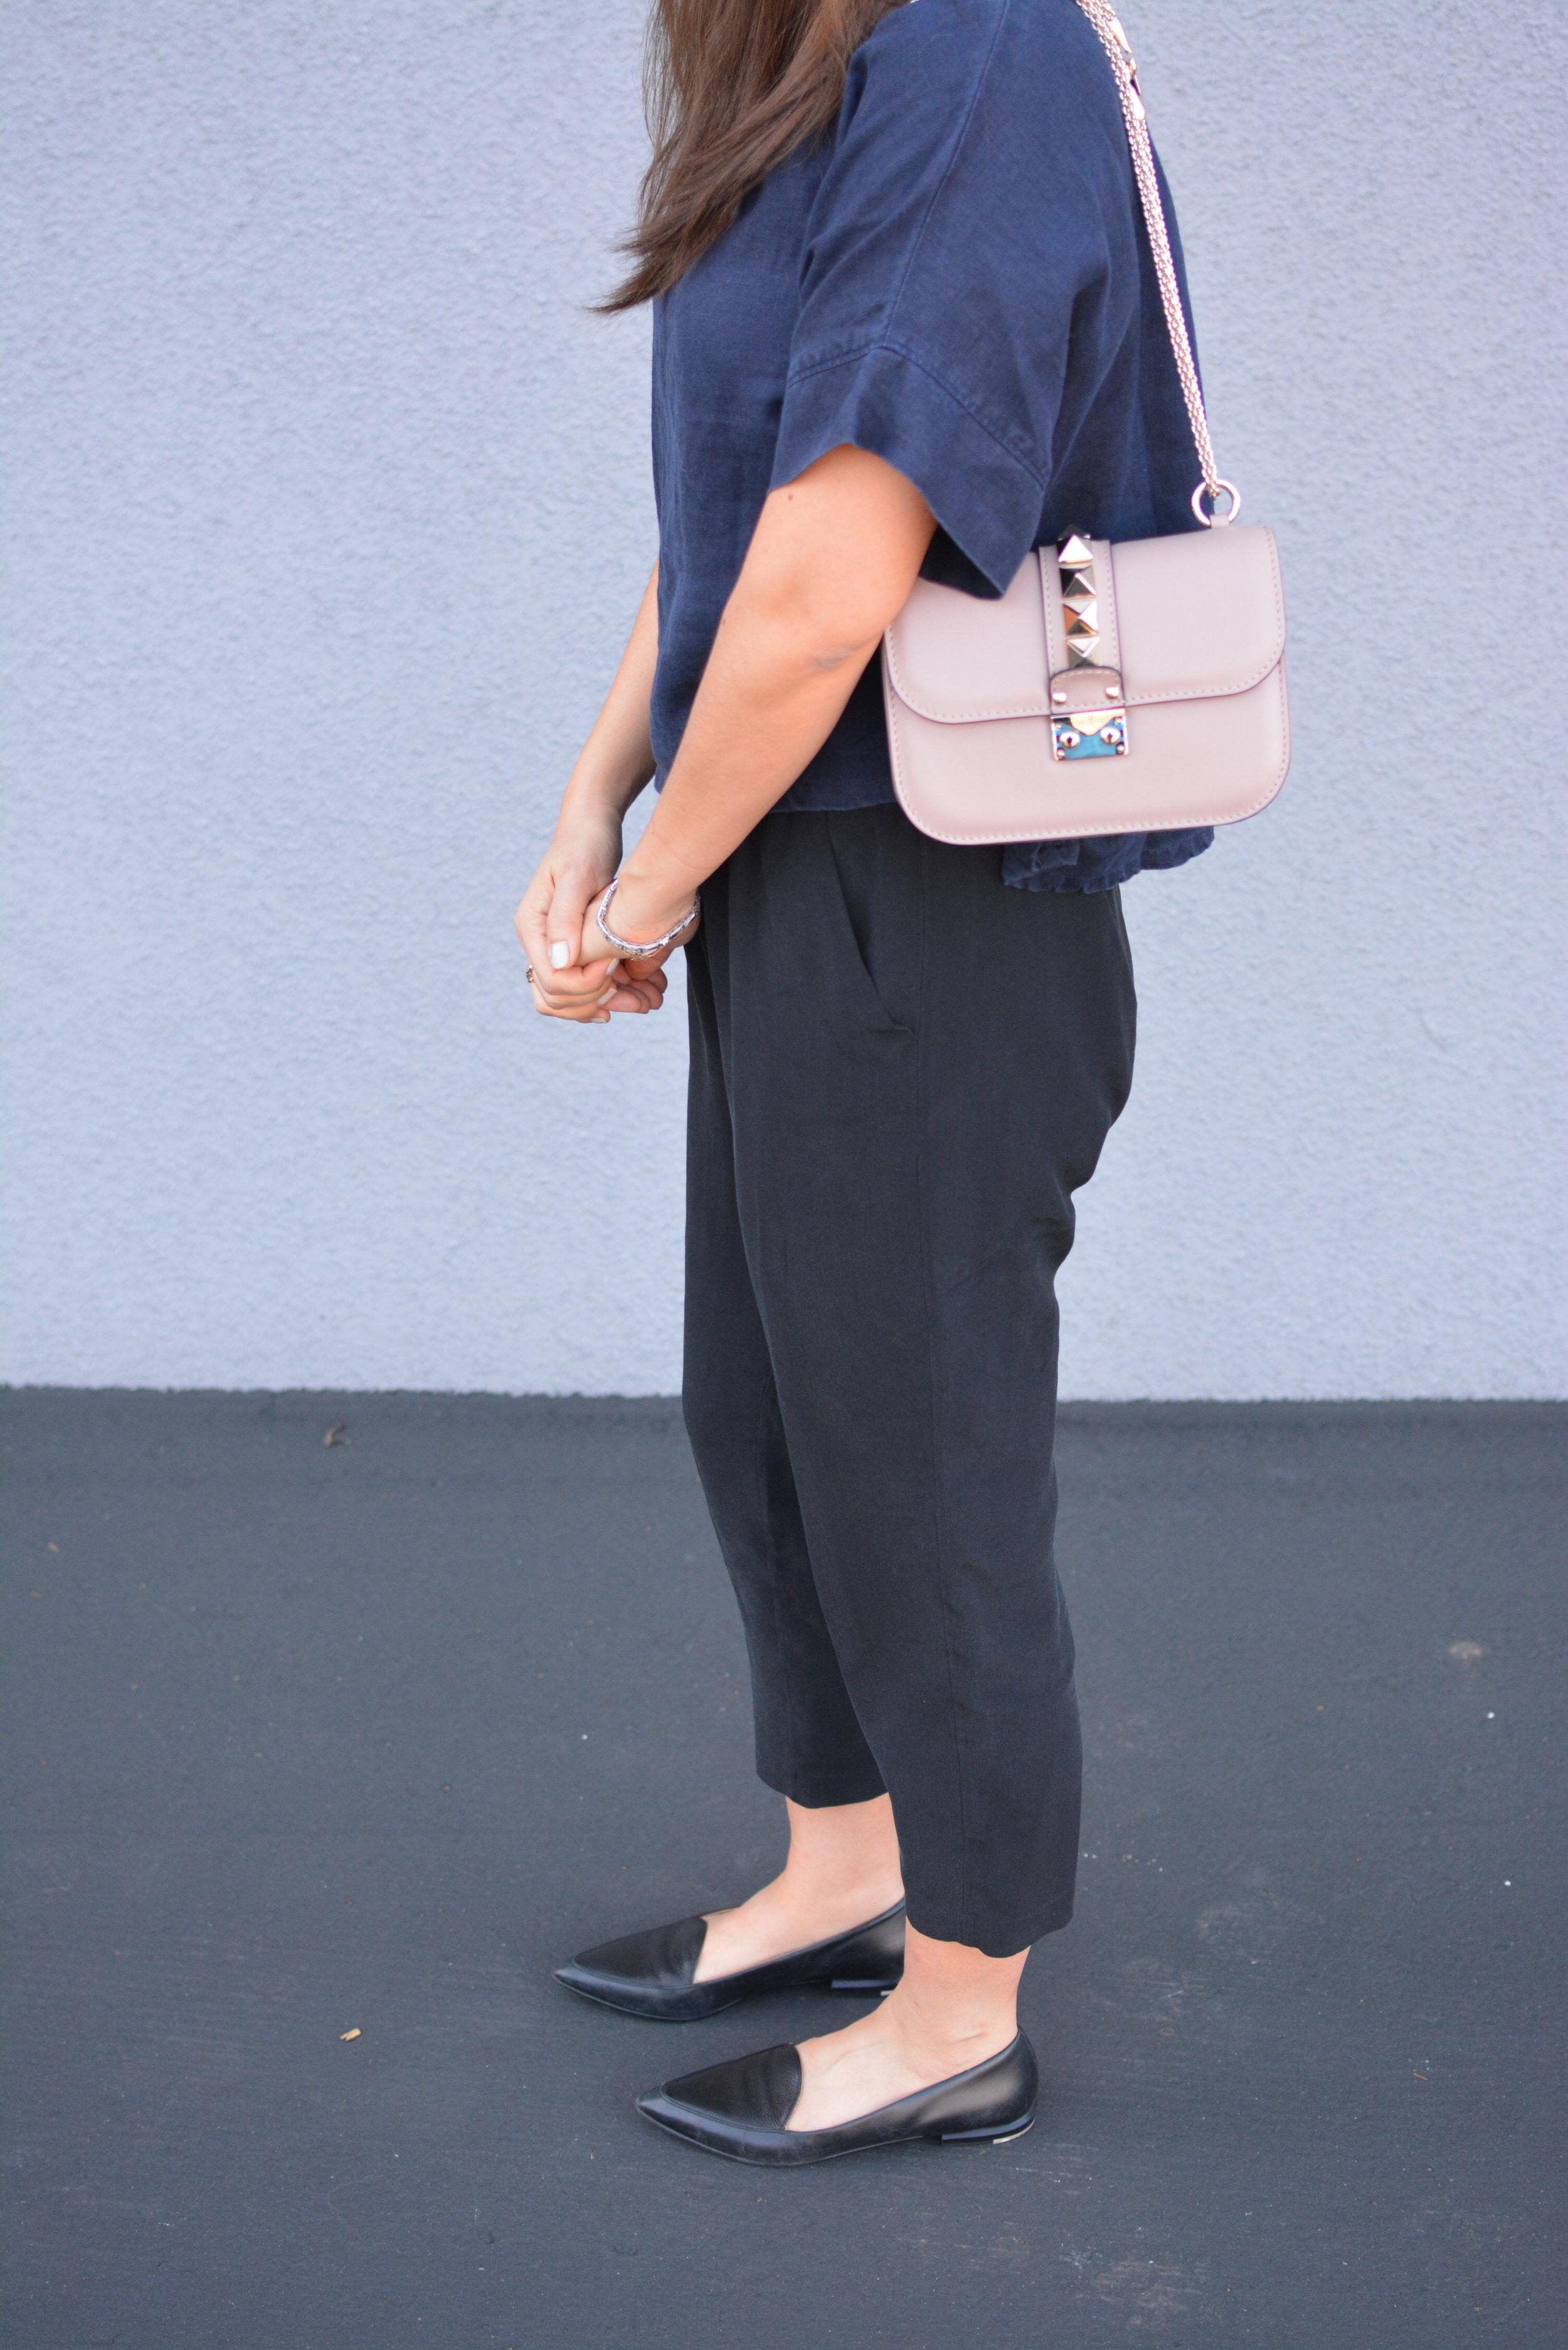 Valentino Glam Lock Bag review 5 (1 of 1).jpg